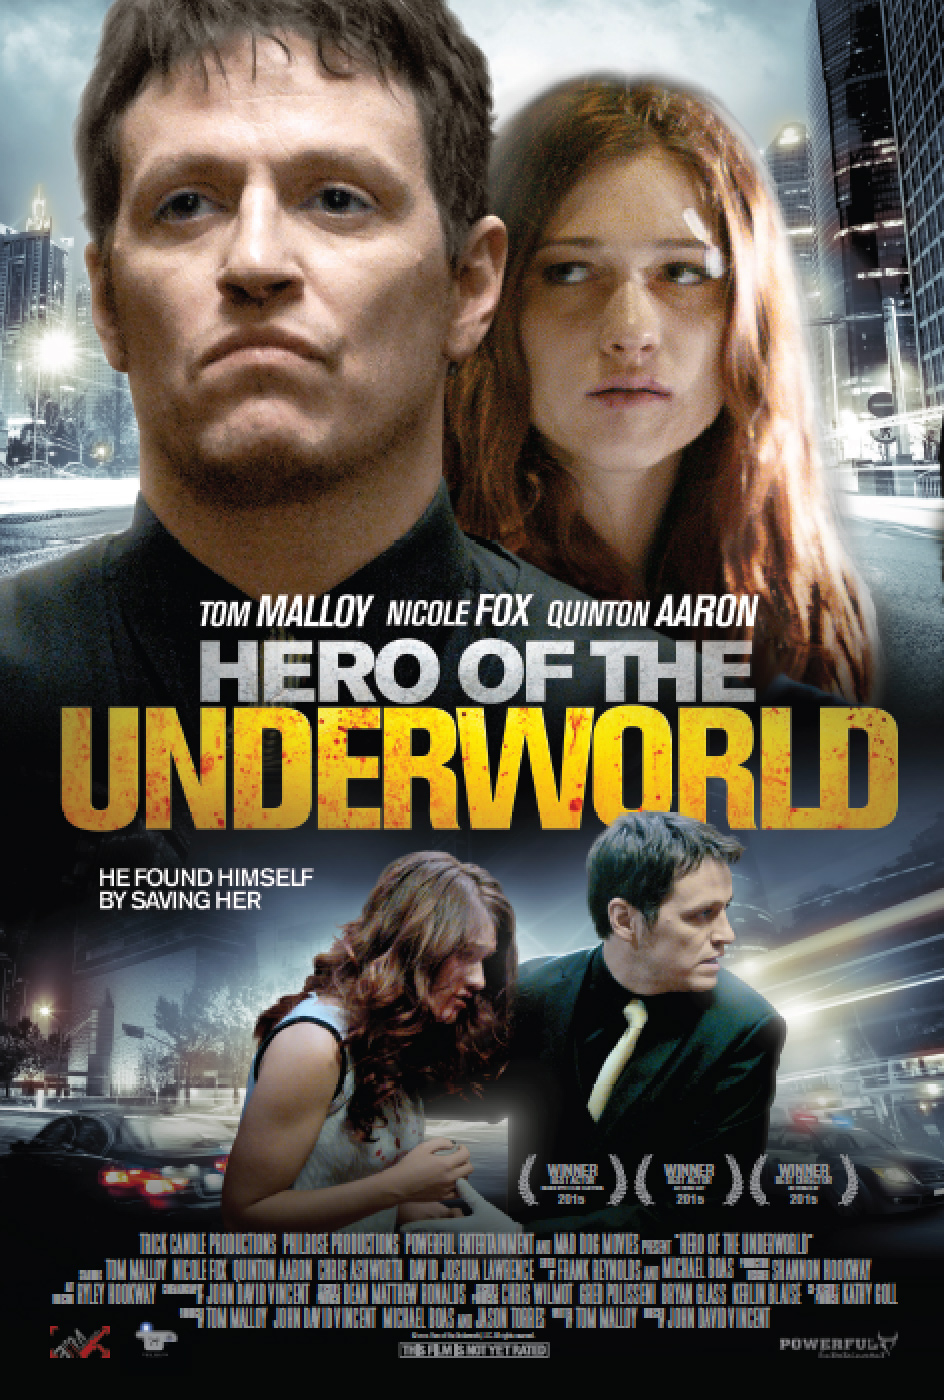 Hero of the Underworld full movie streaming